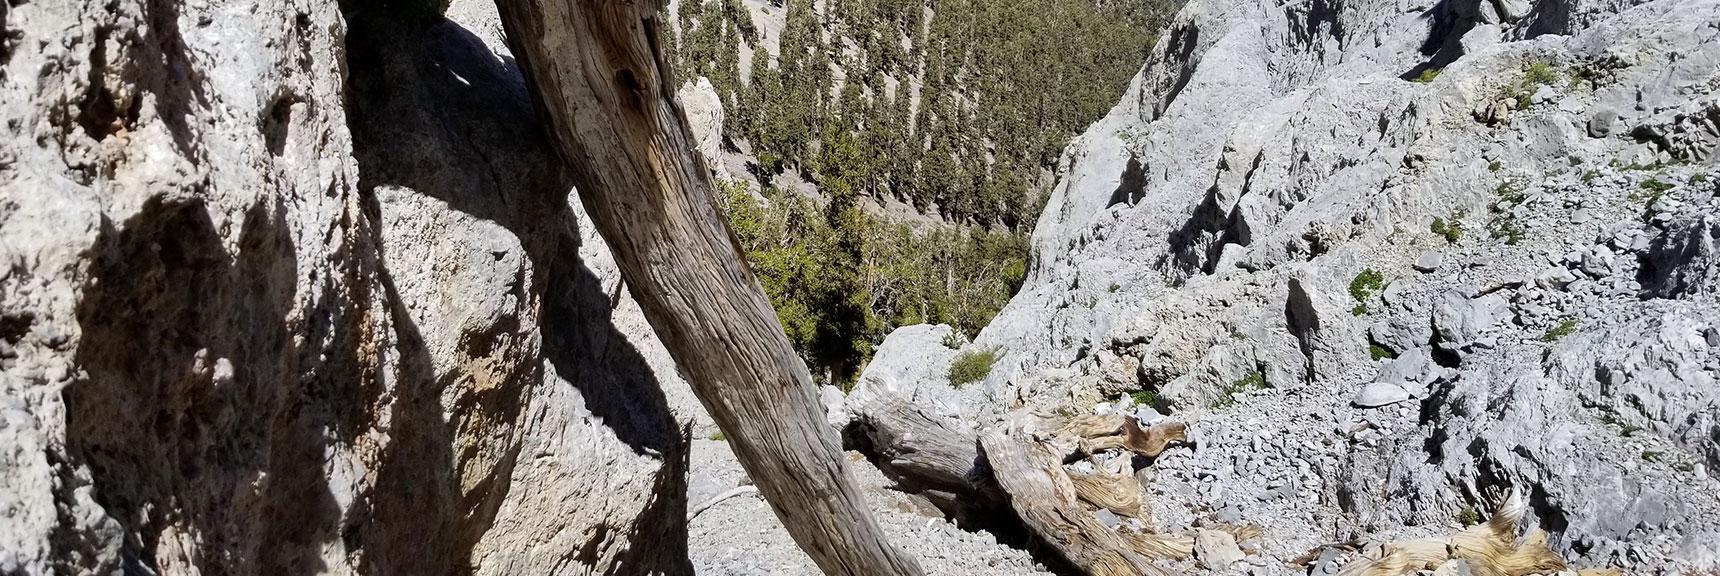 100ft Drop Below 10ft Vertical Rock Wall - If You Slip!